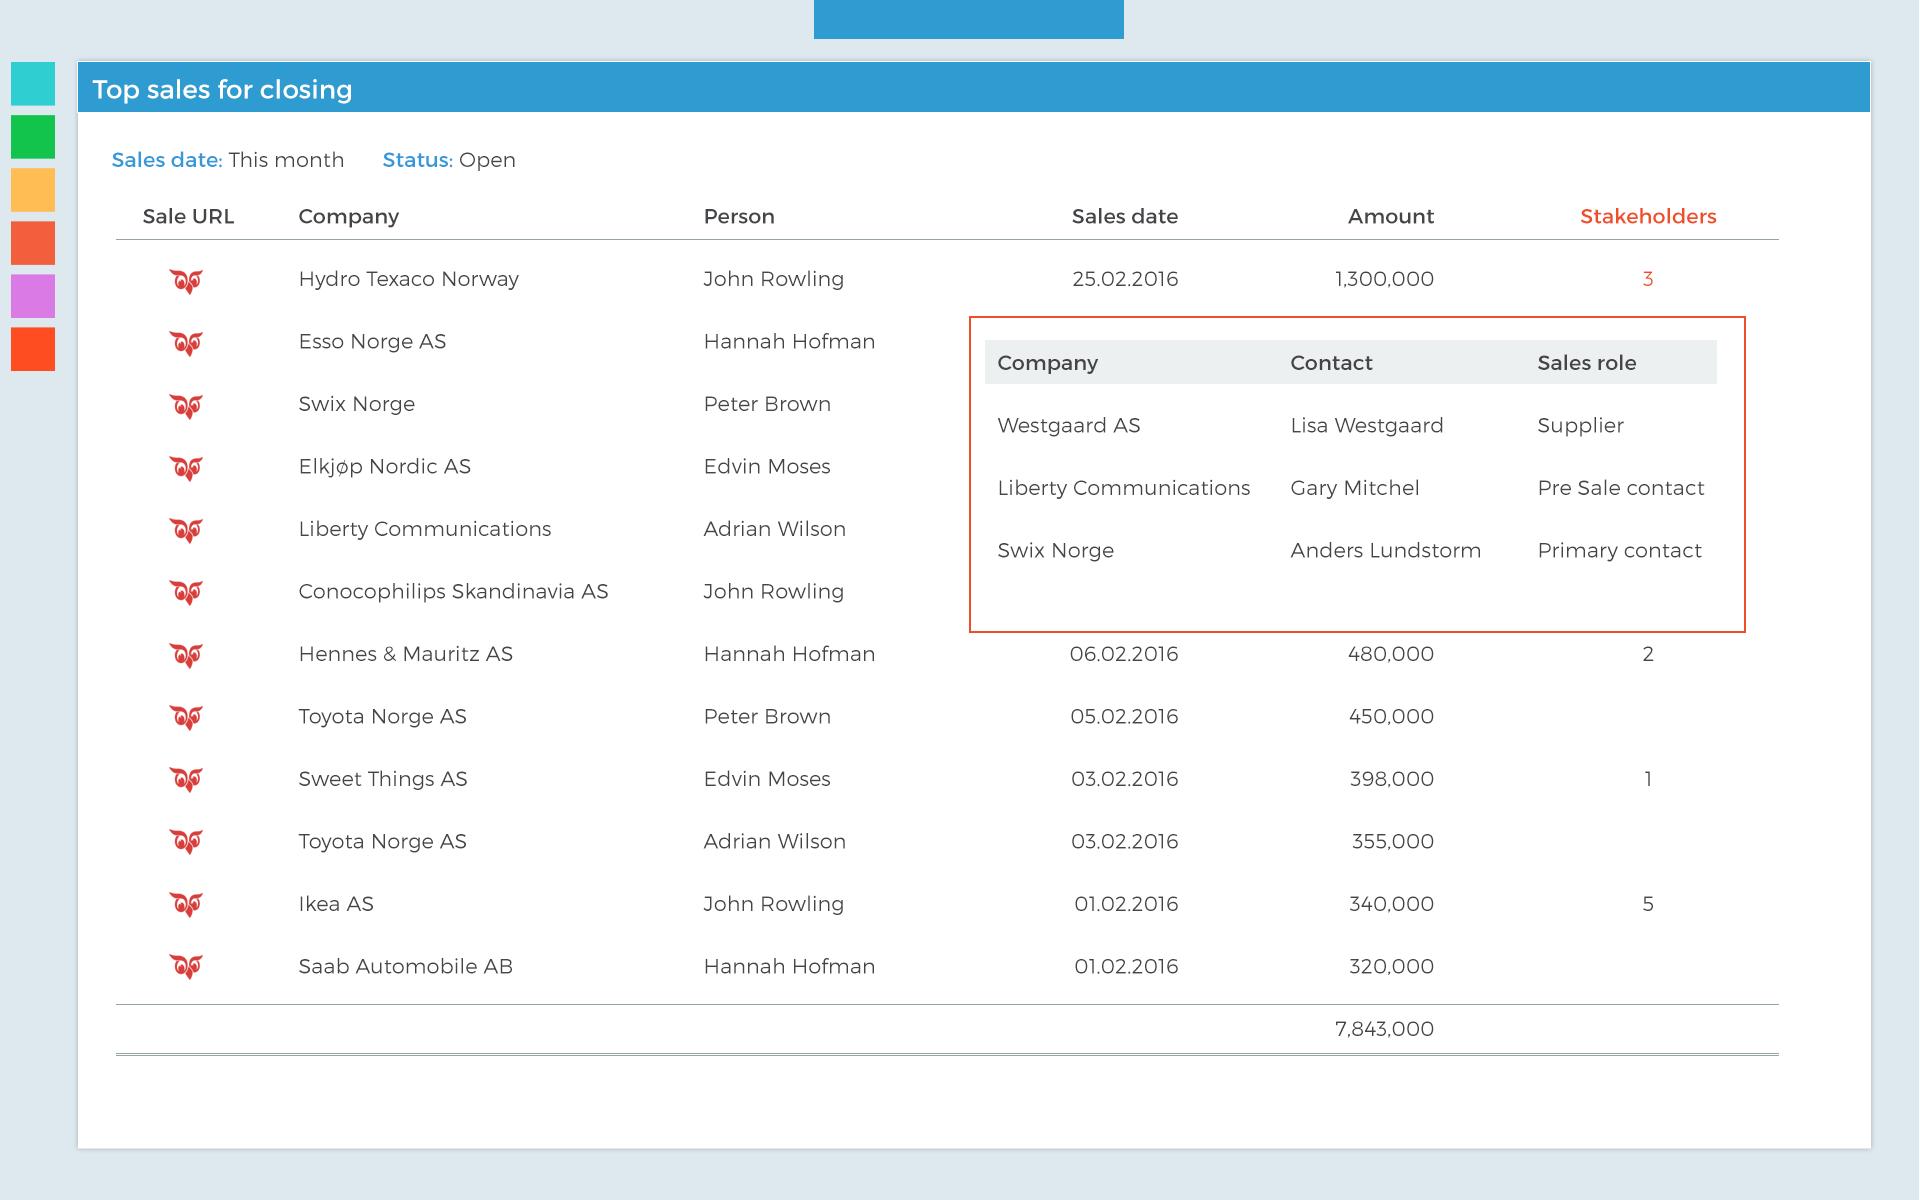 SUA-dashboard-example01-stakeholders